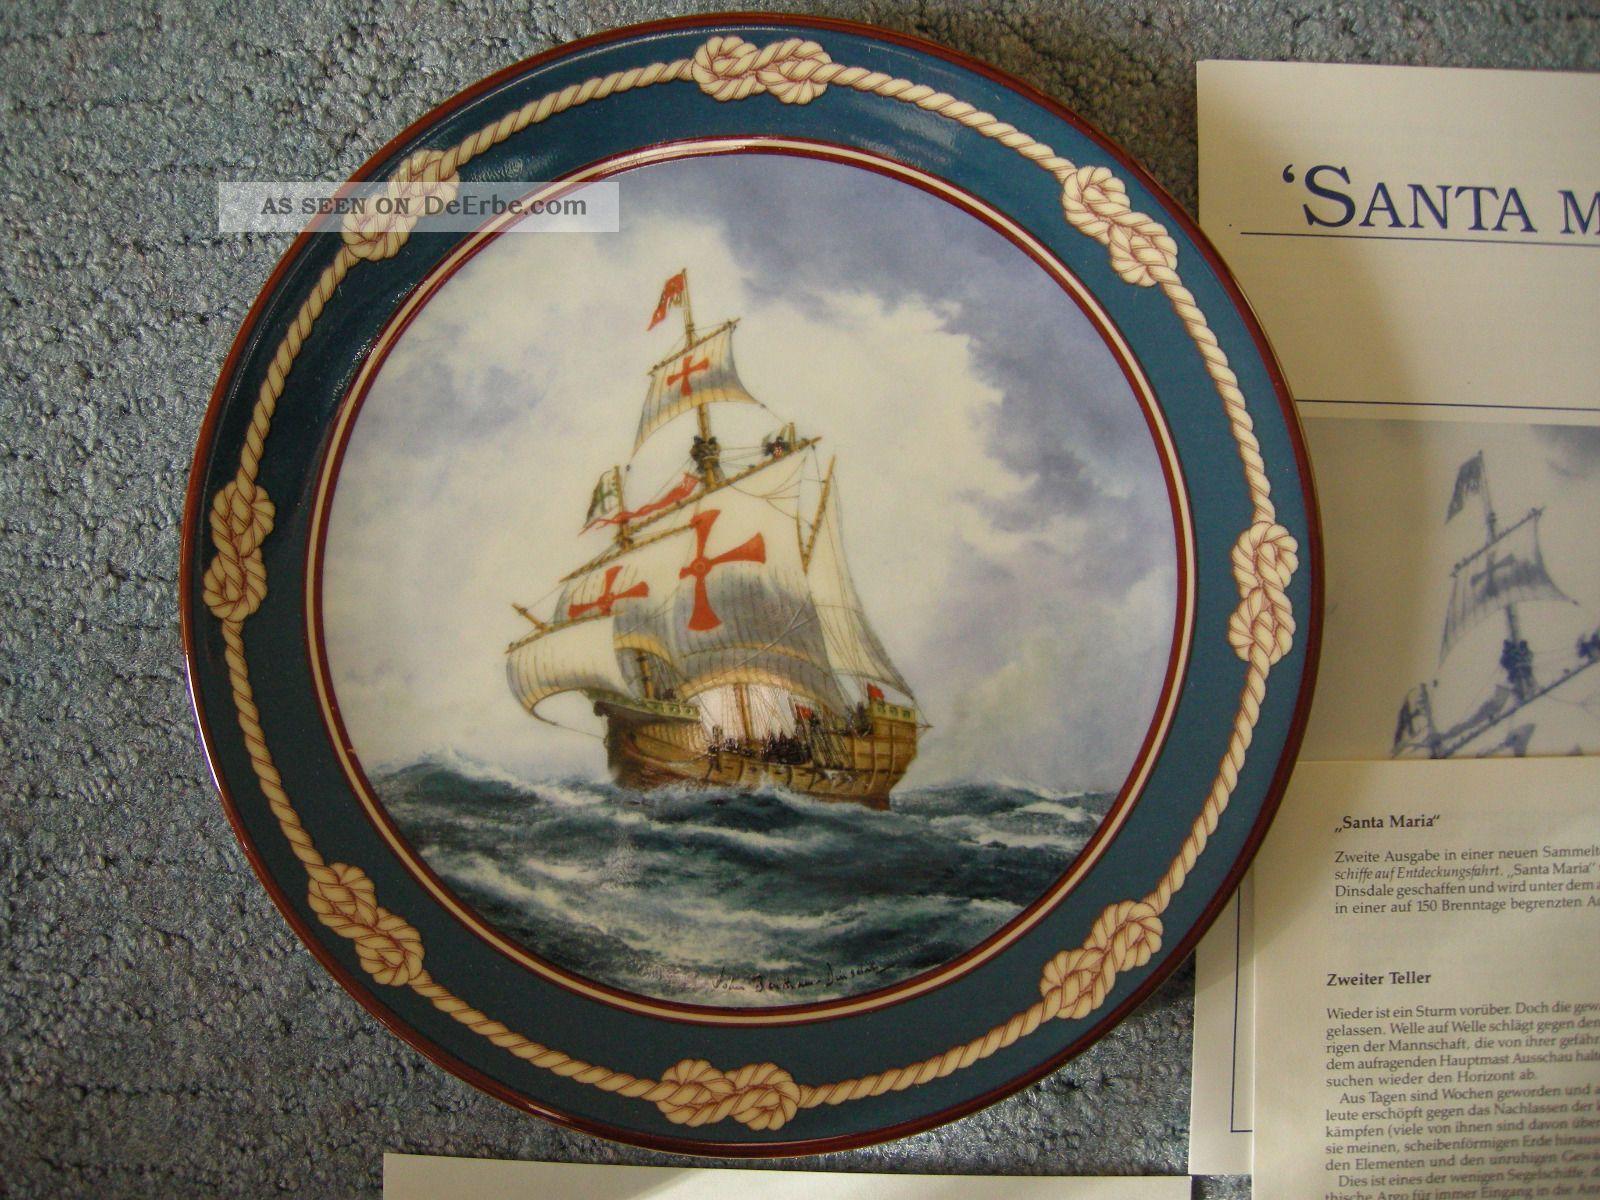 Royal Doulton Sammelteller Santa Maria Bentham - Dinsdale 26 - R62 - 26.  2 Nautika & Maritimes Bild